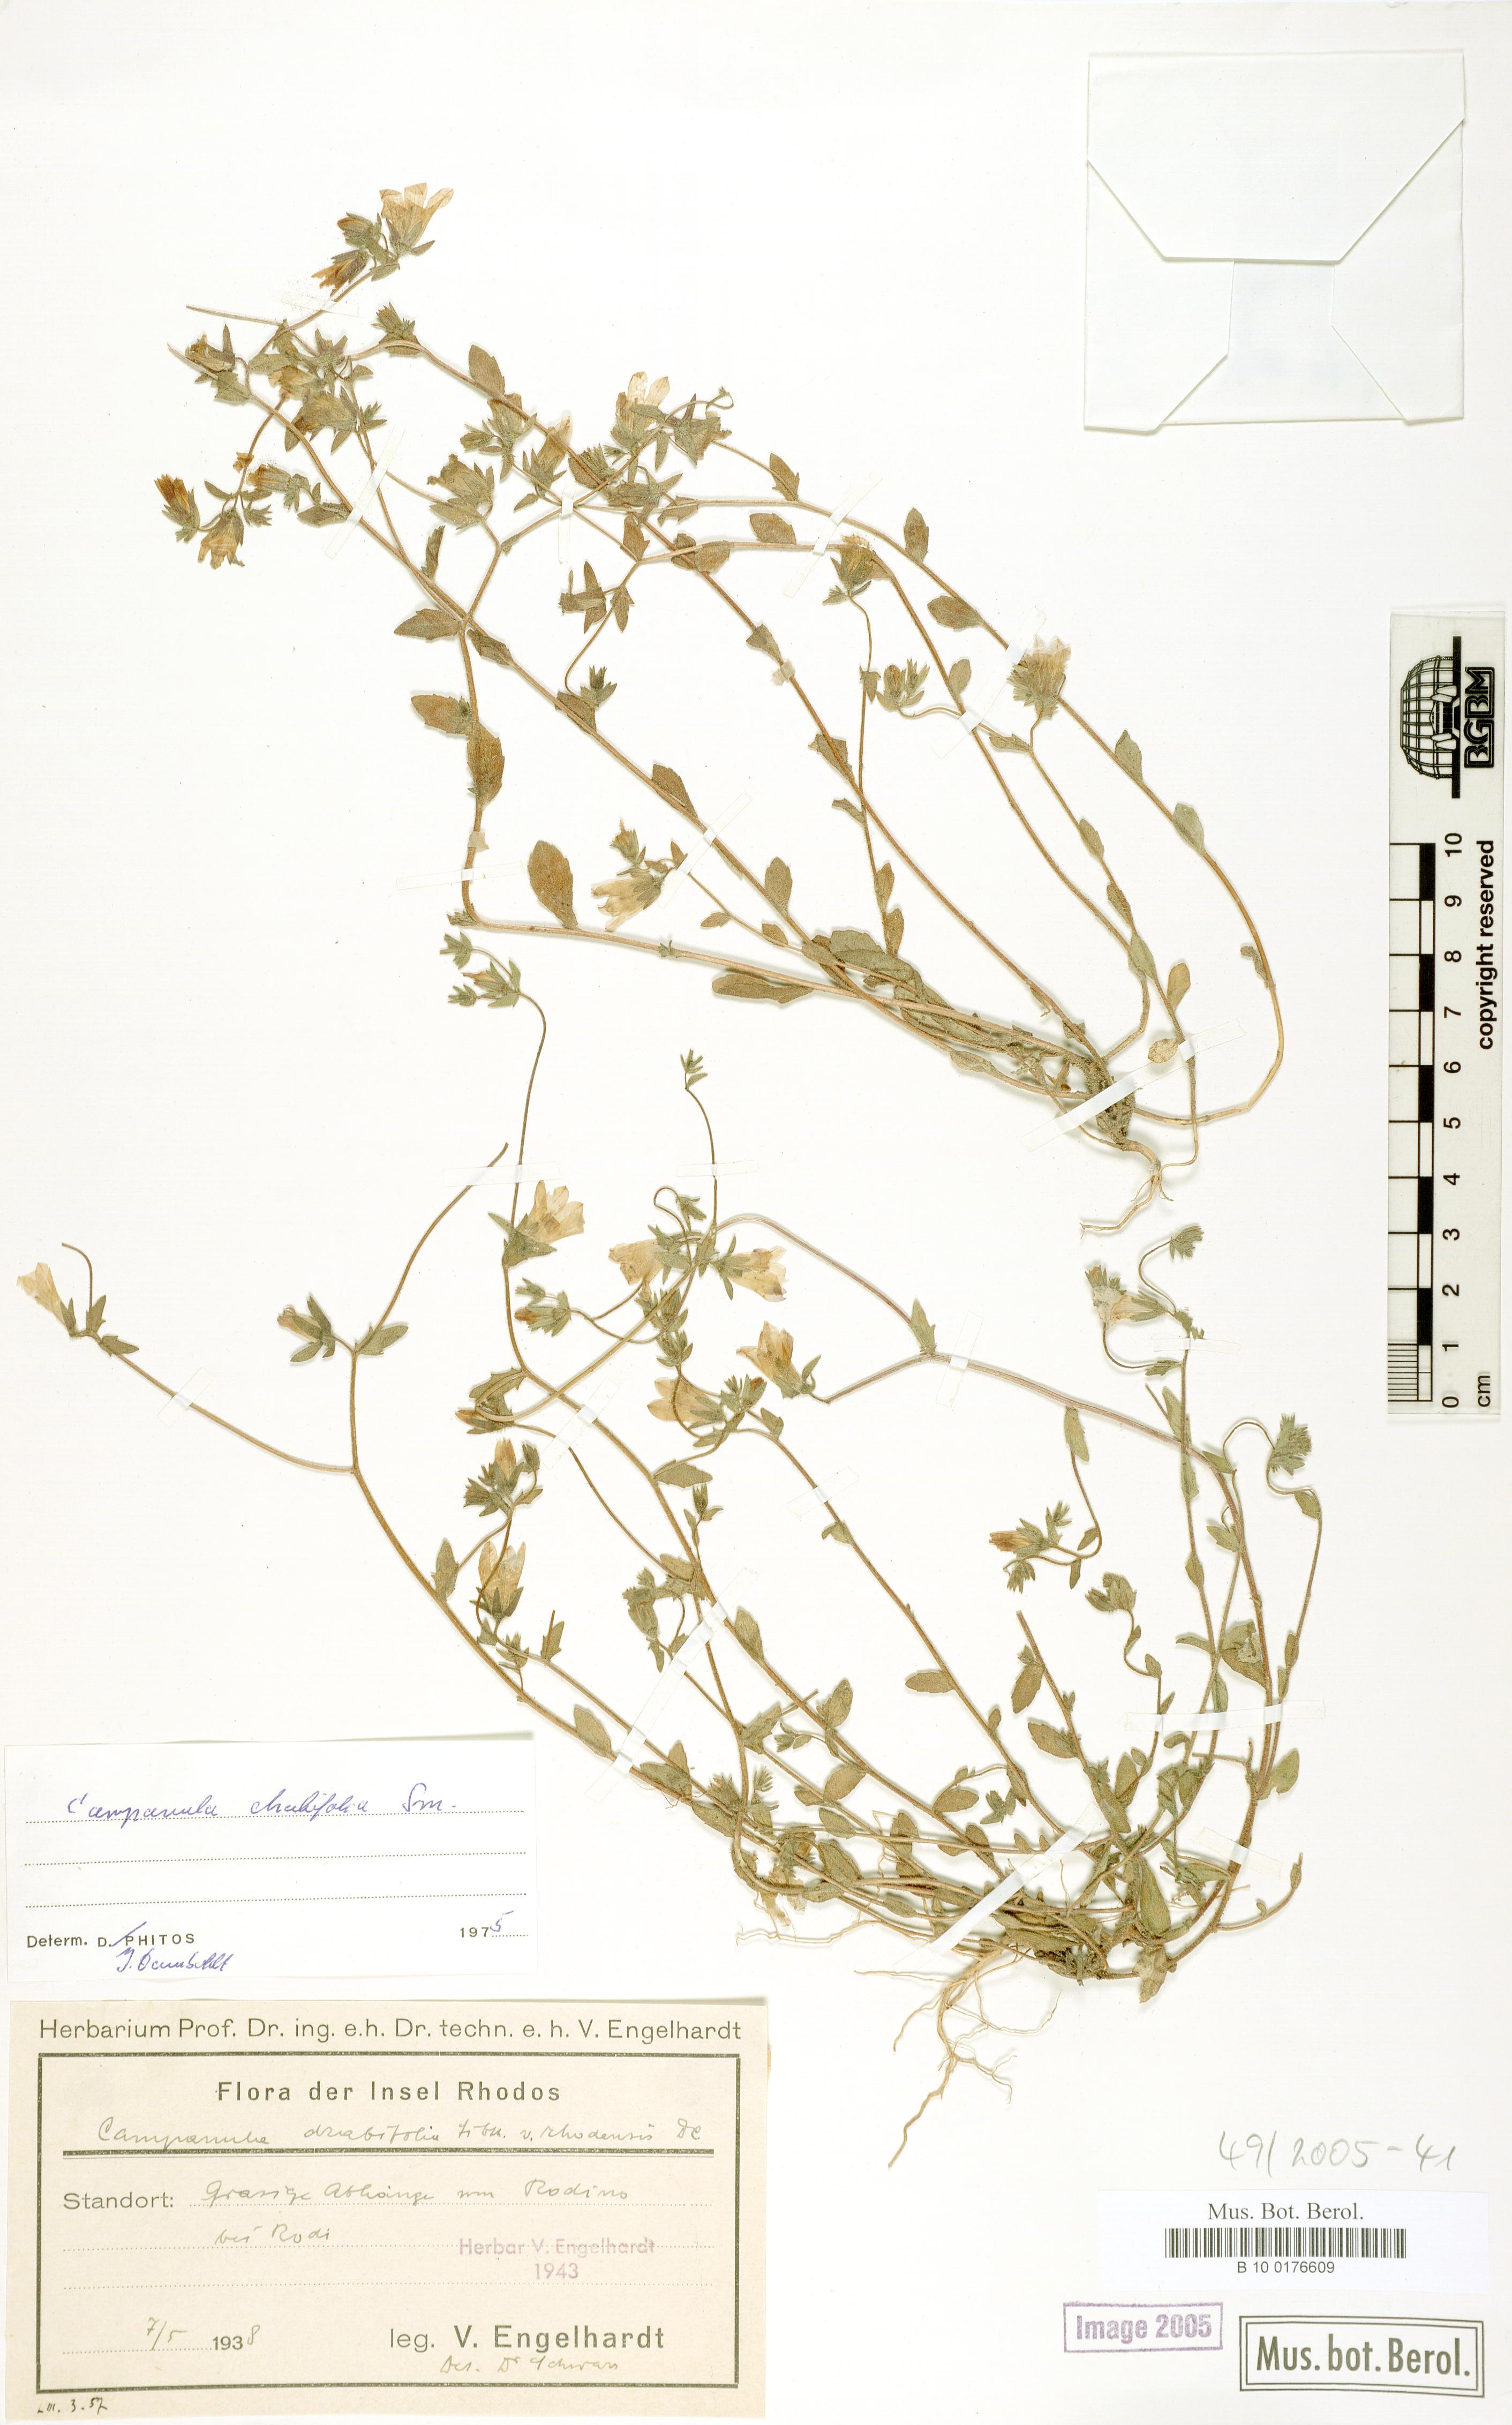 http://ww2.bgbm.org/herbarium/images/B/10/01/76/60/B_10_0176609.jpg